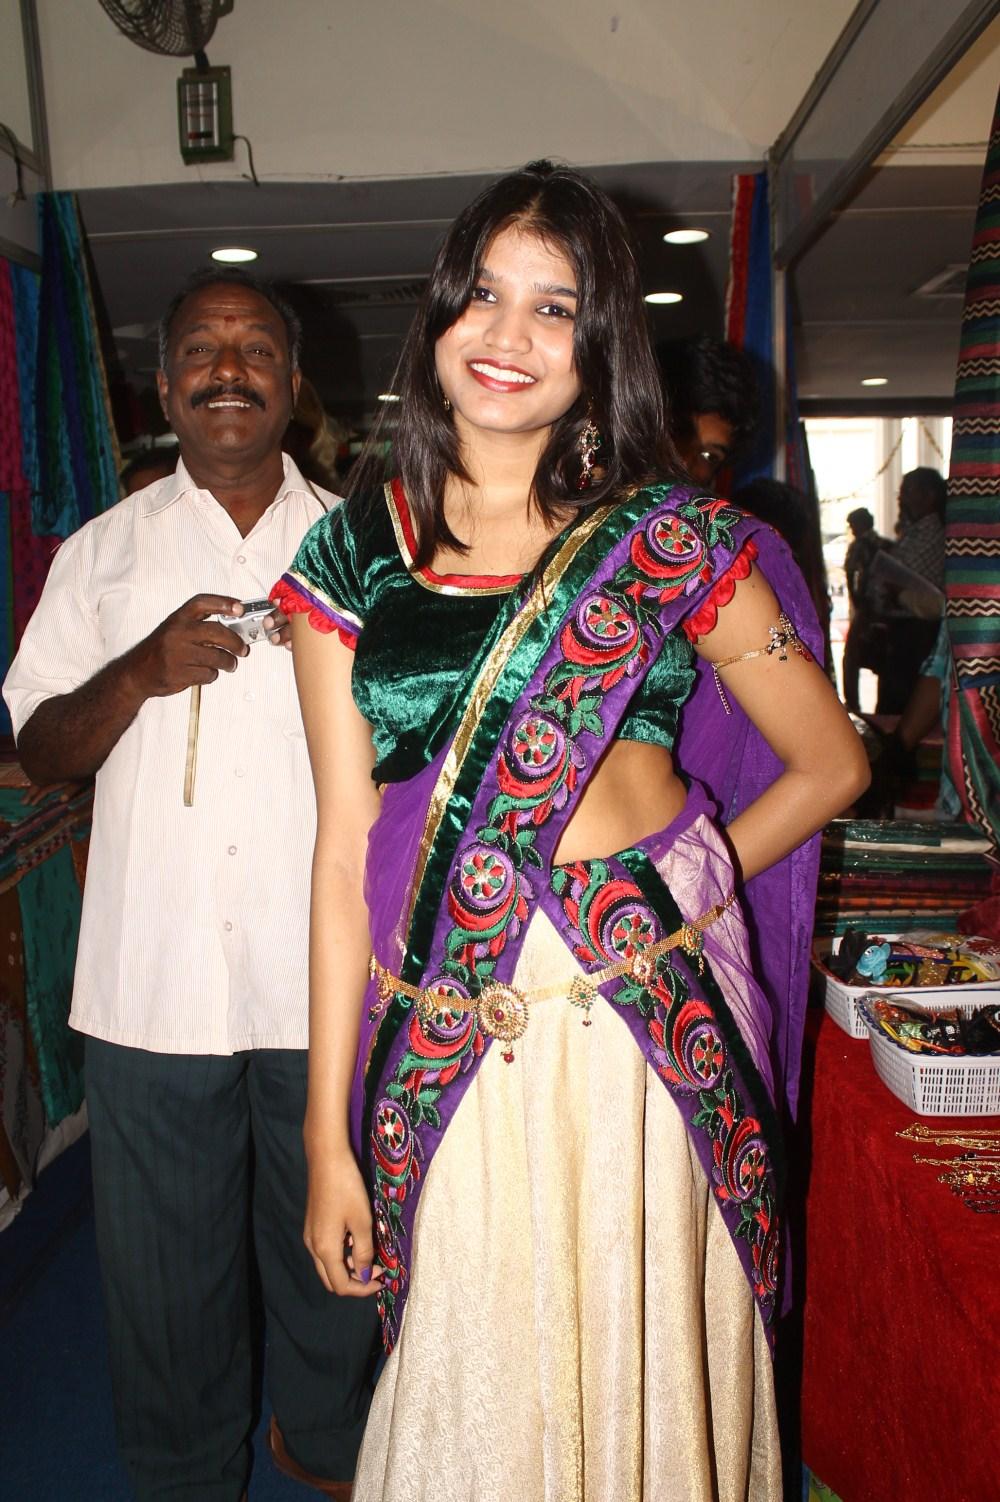 Beautiful Isha agarwal looking lovely at store latest pics